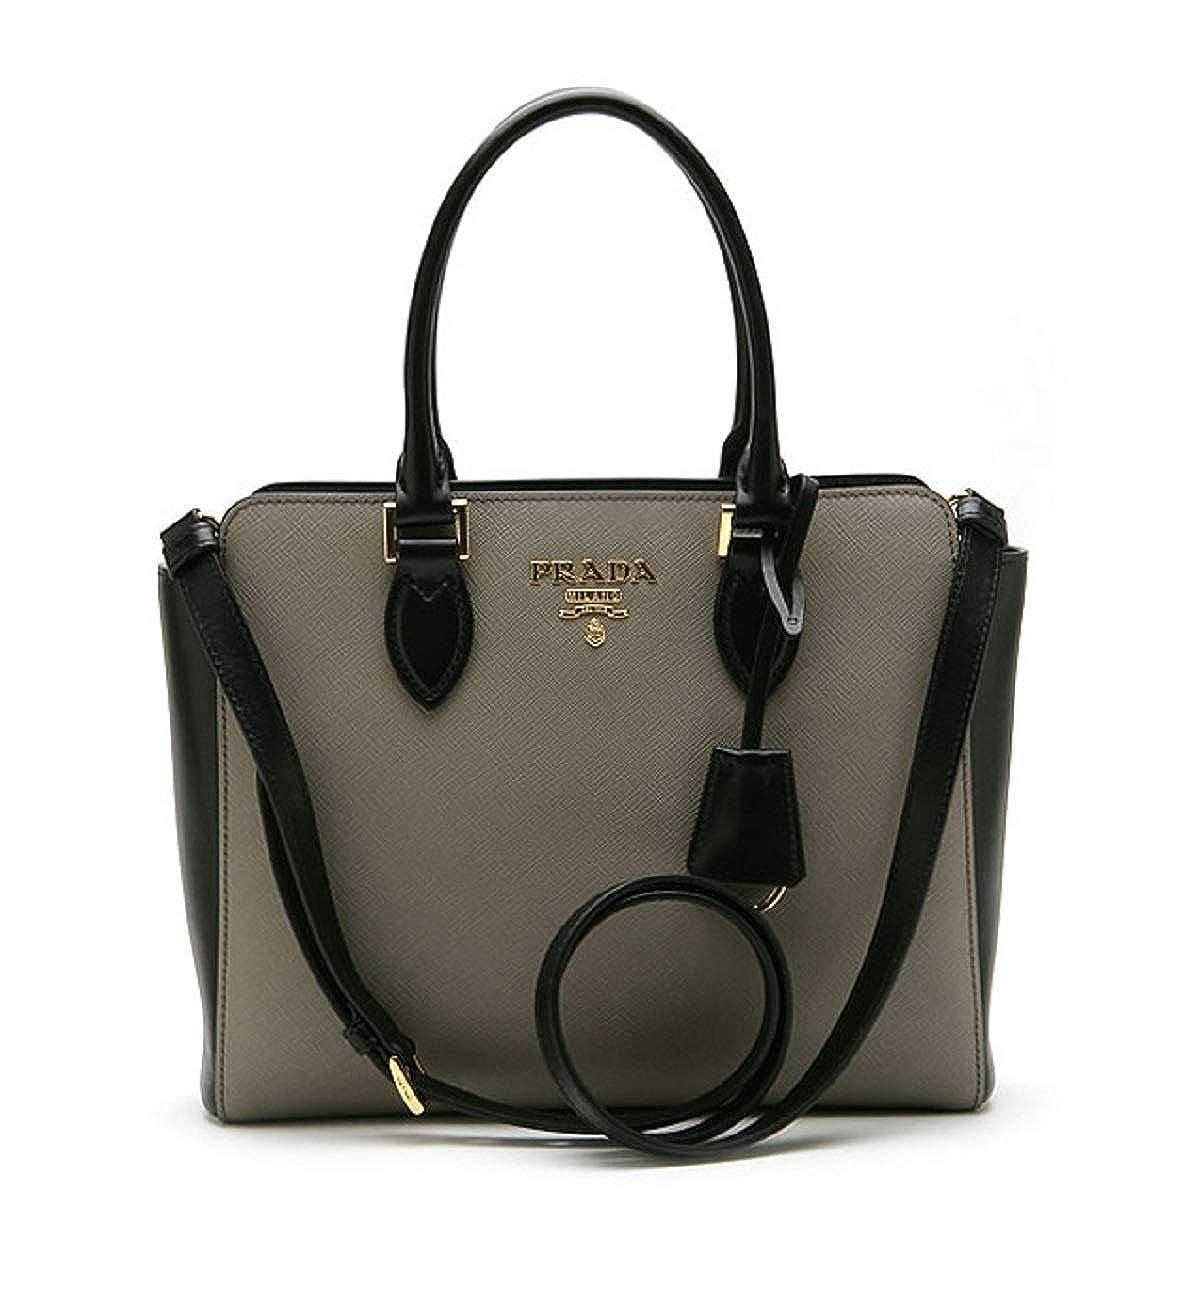 Prada Saffiano Leather Argilla Nero Two-Toned Black and Gray Handbag  1BA113  Handbags  Amazon.com